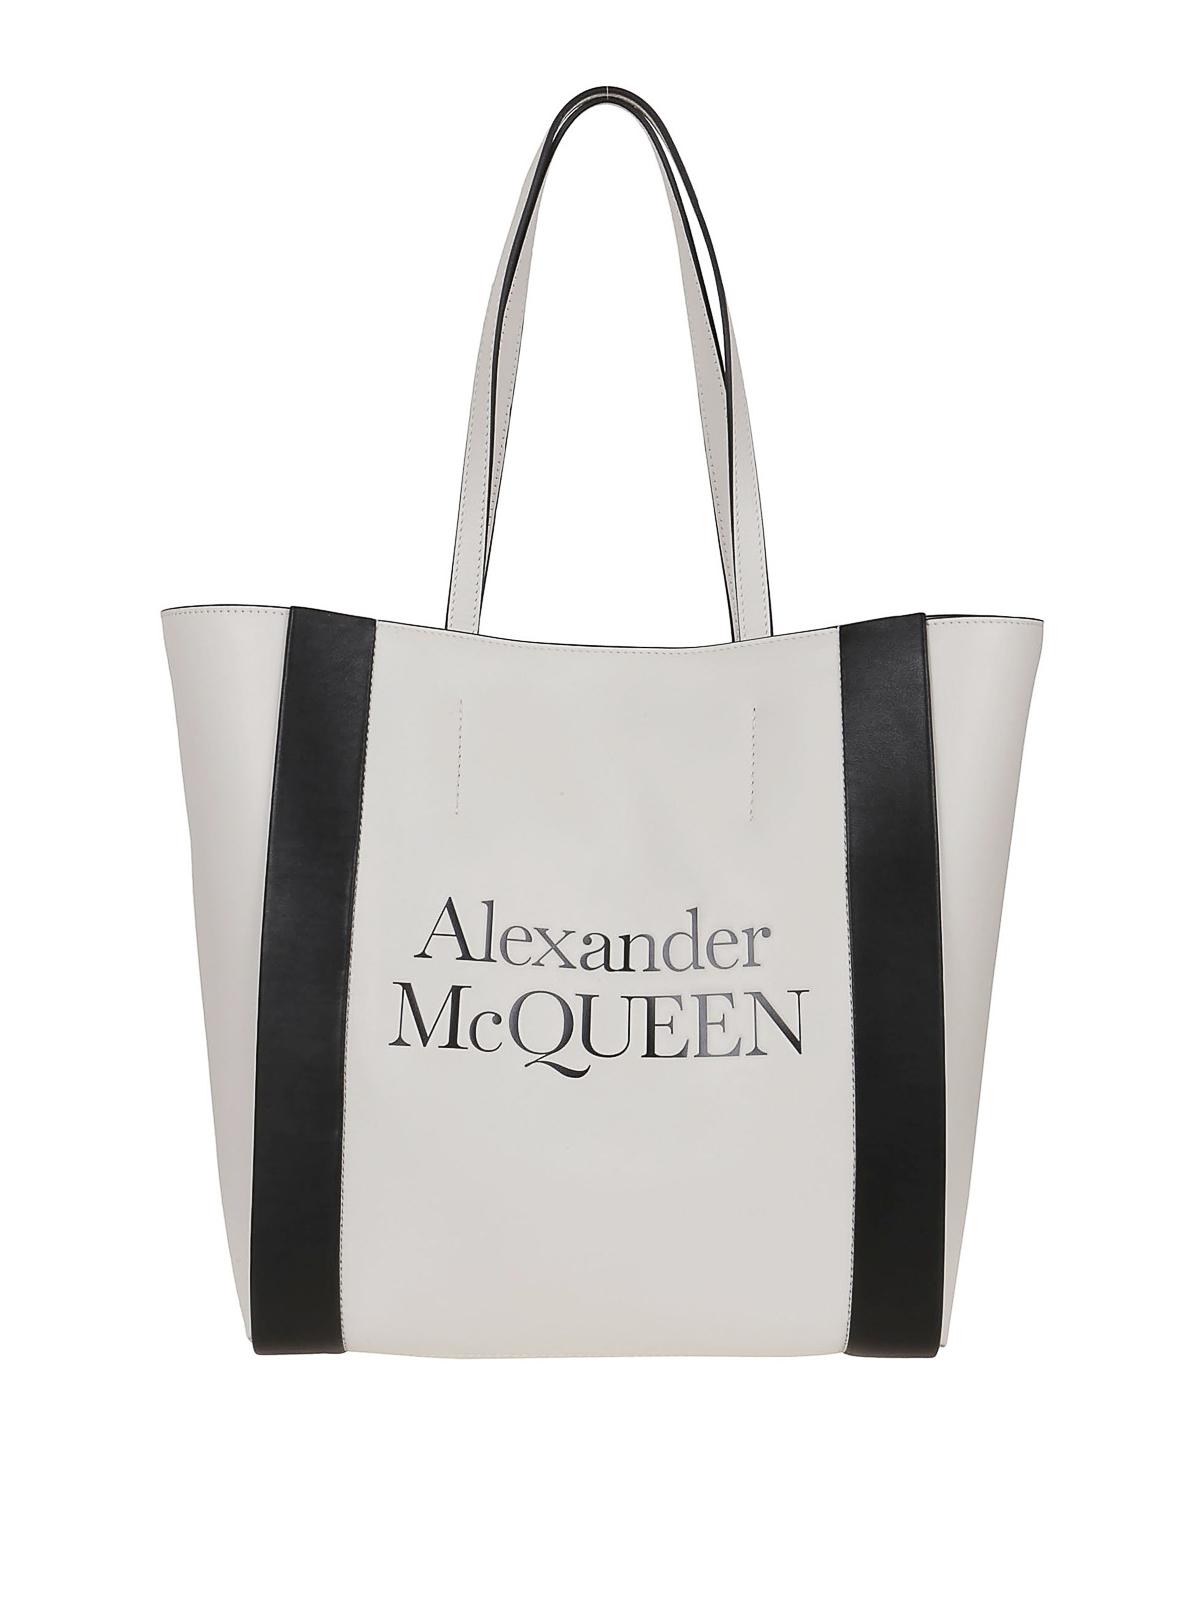 Alexander Mcqueen Signature Tote In White